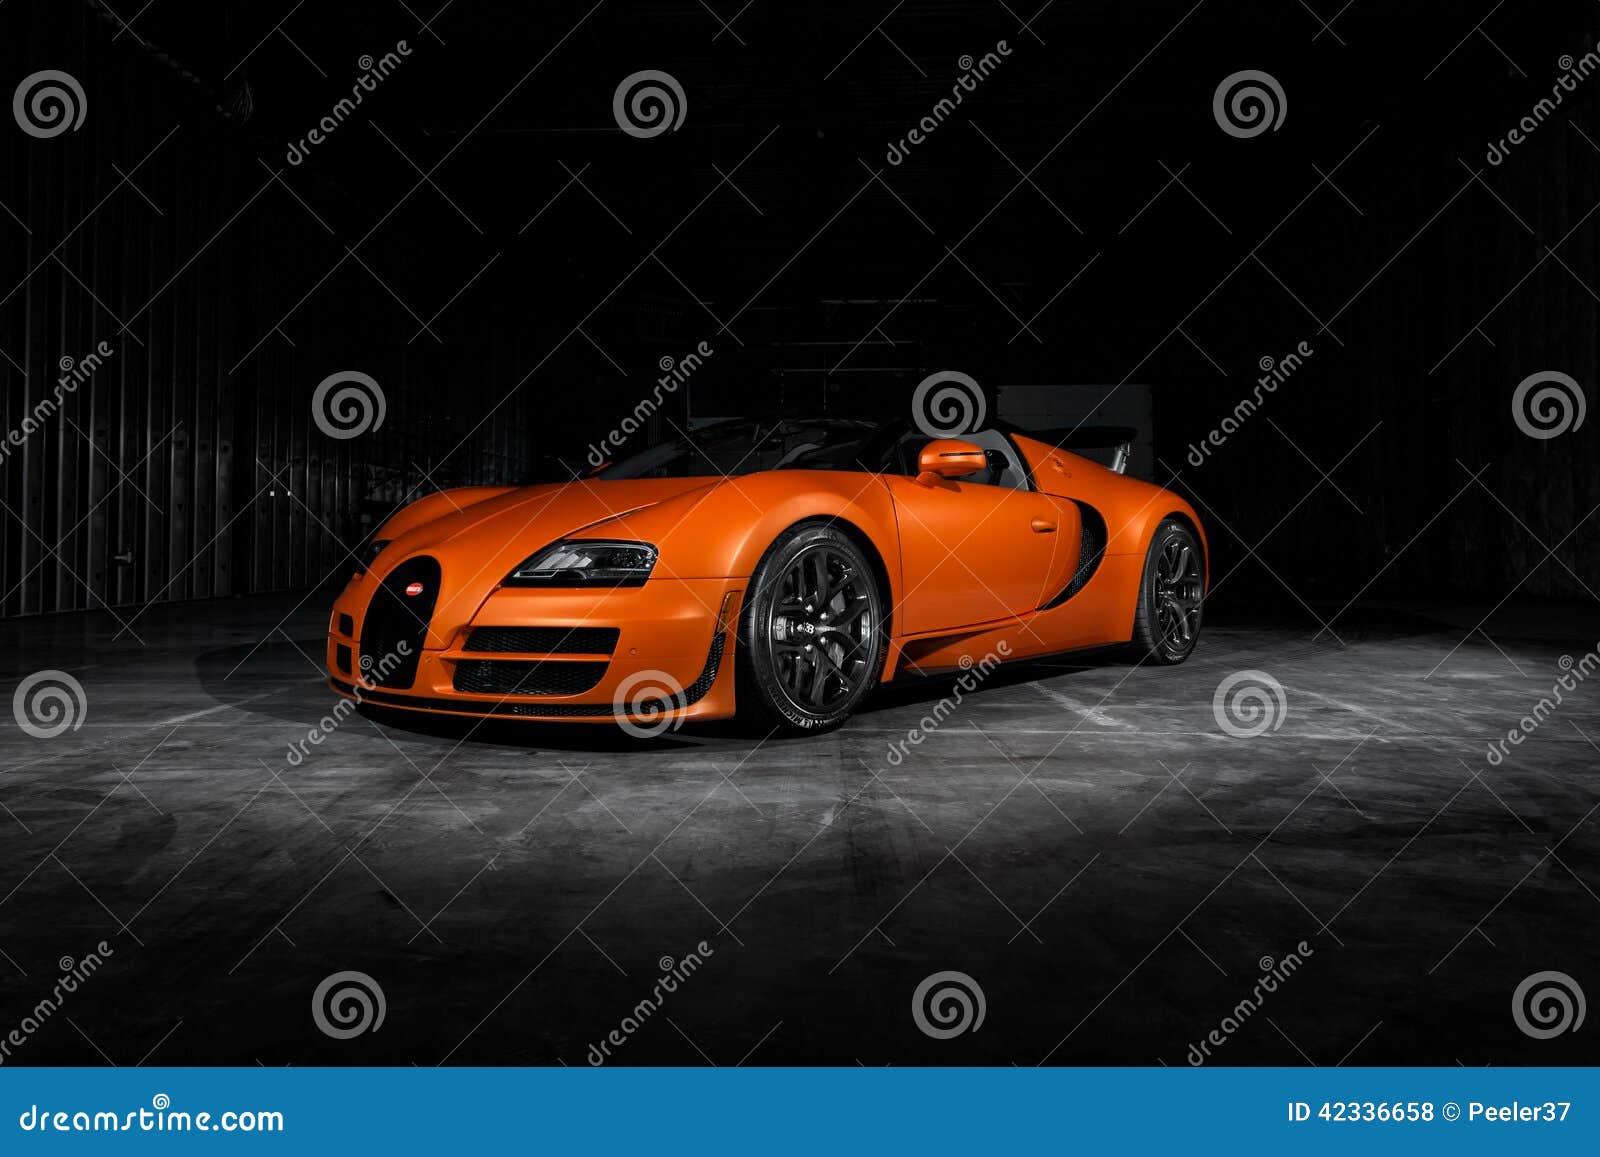 bugatti veyron vitesse redactionele stock foto afbeelding bestaande uit auto 42336658. Black Bedroom Furniture Sets. Home Design Ideas